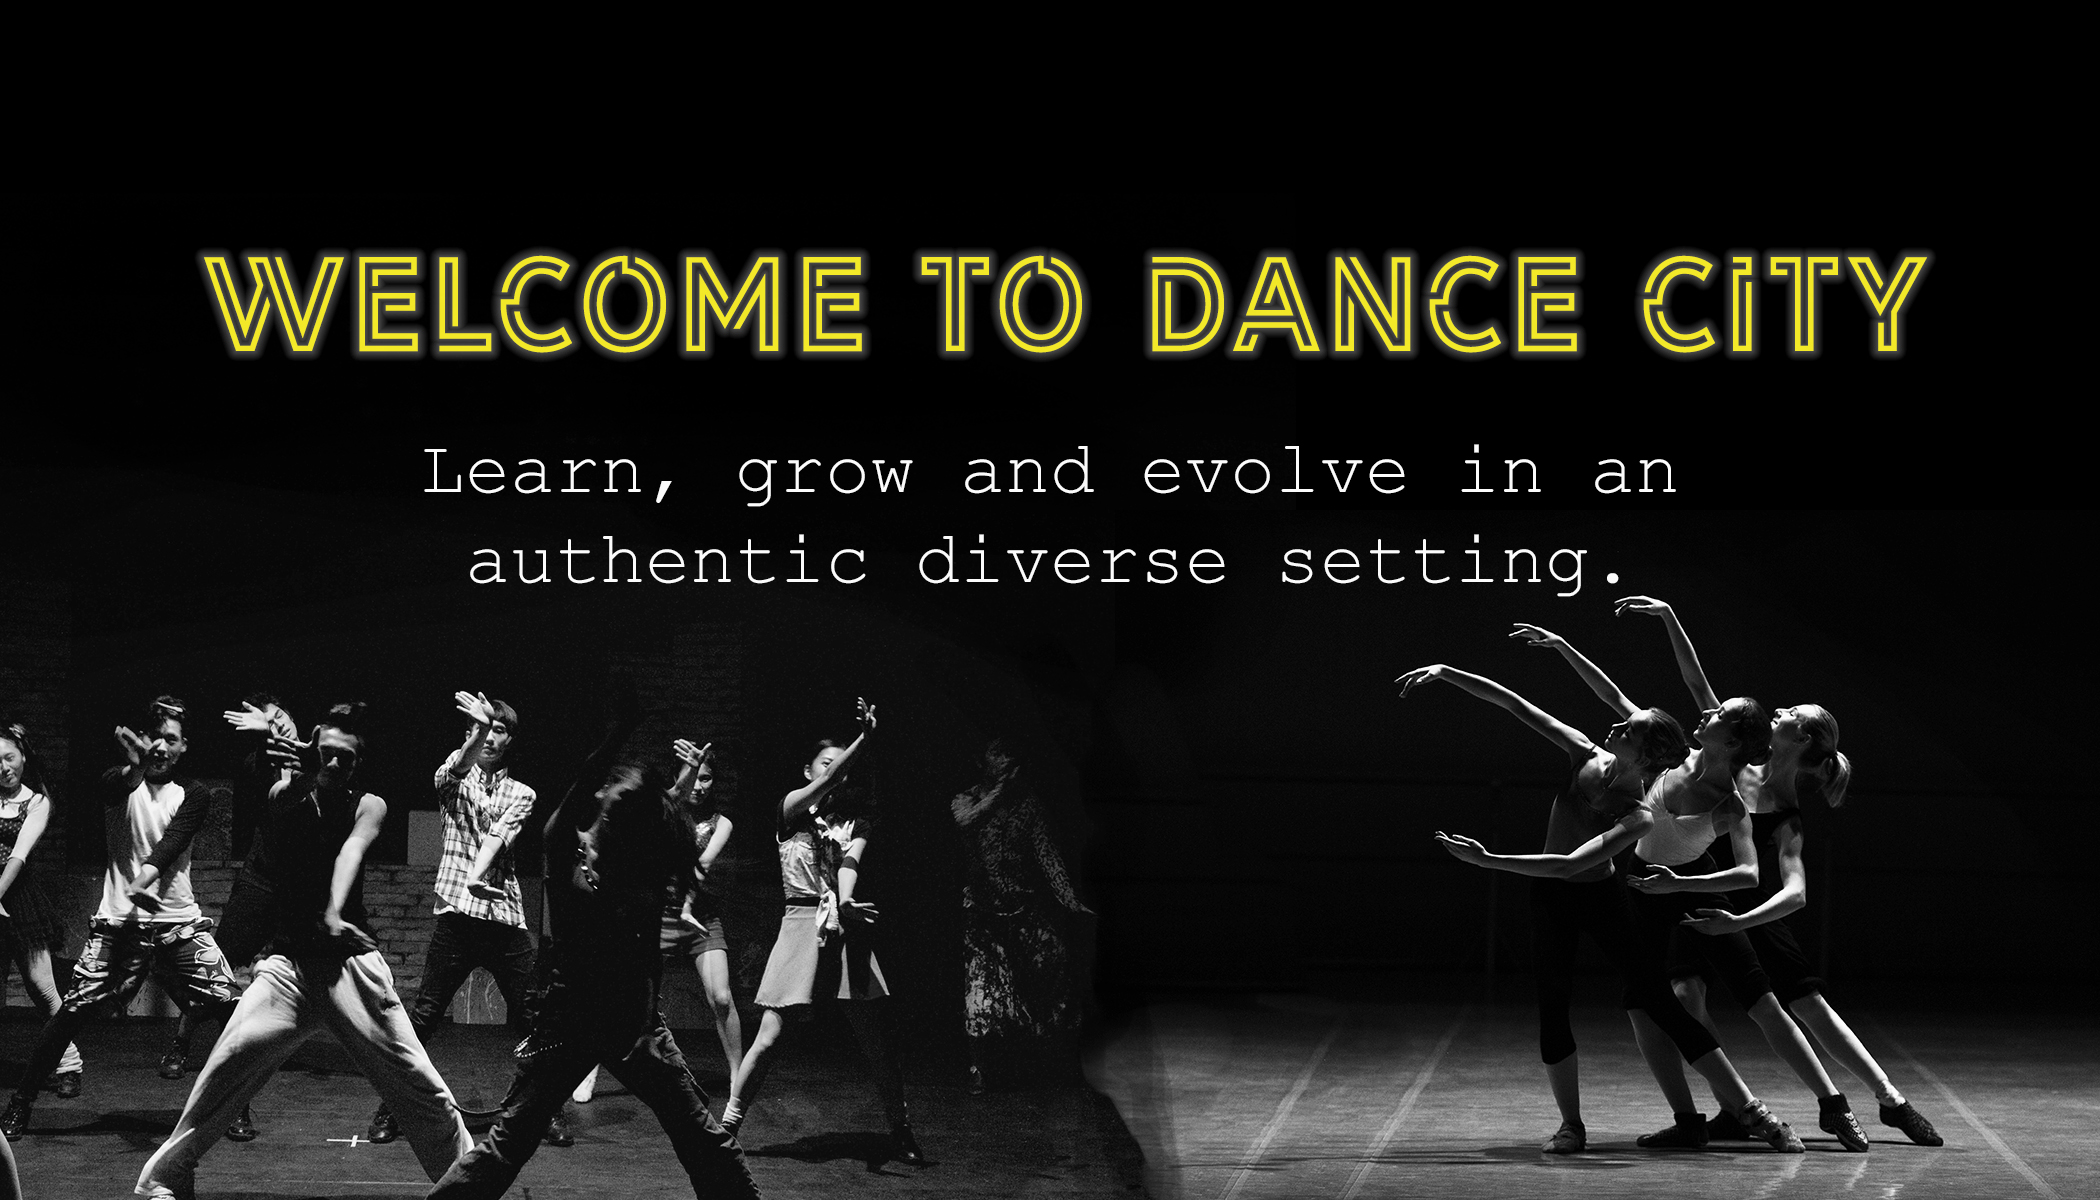 dance+city+homepage.jpg